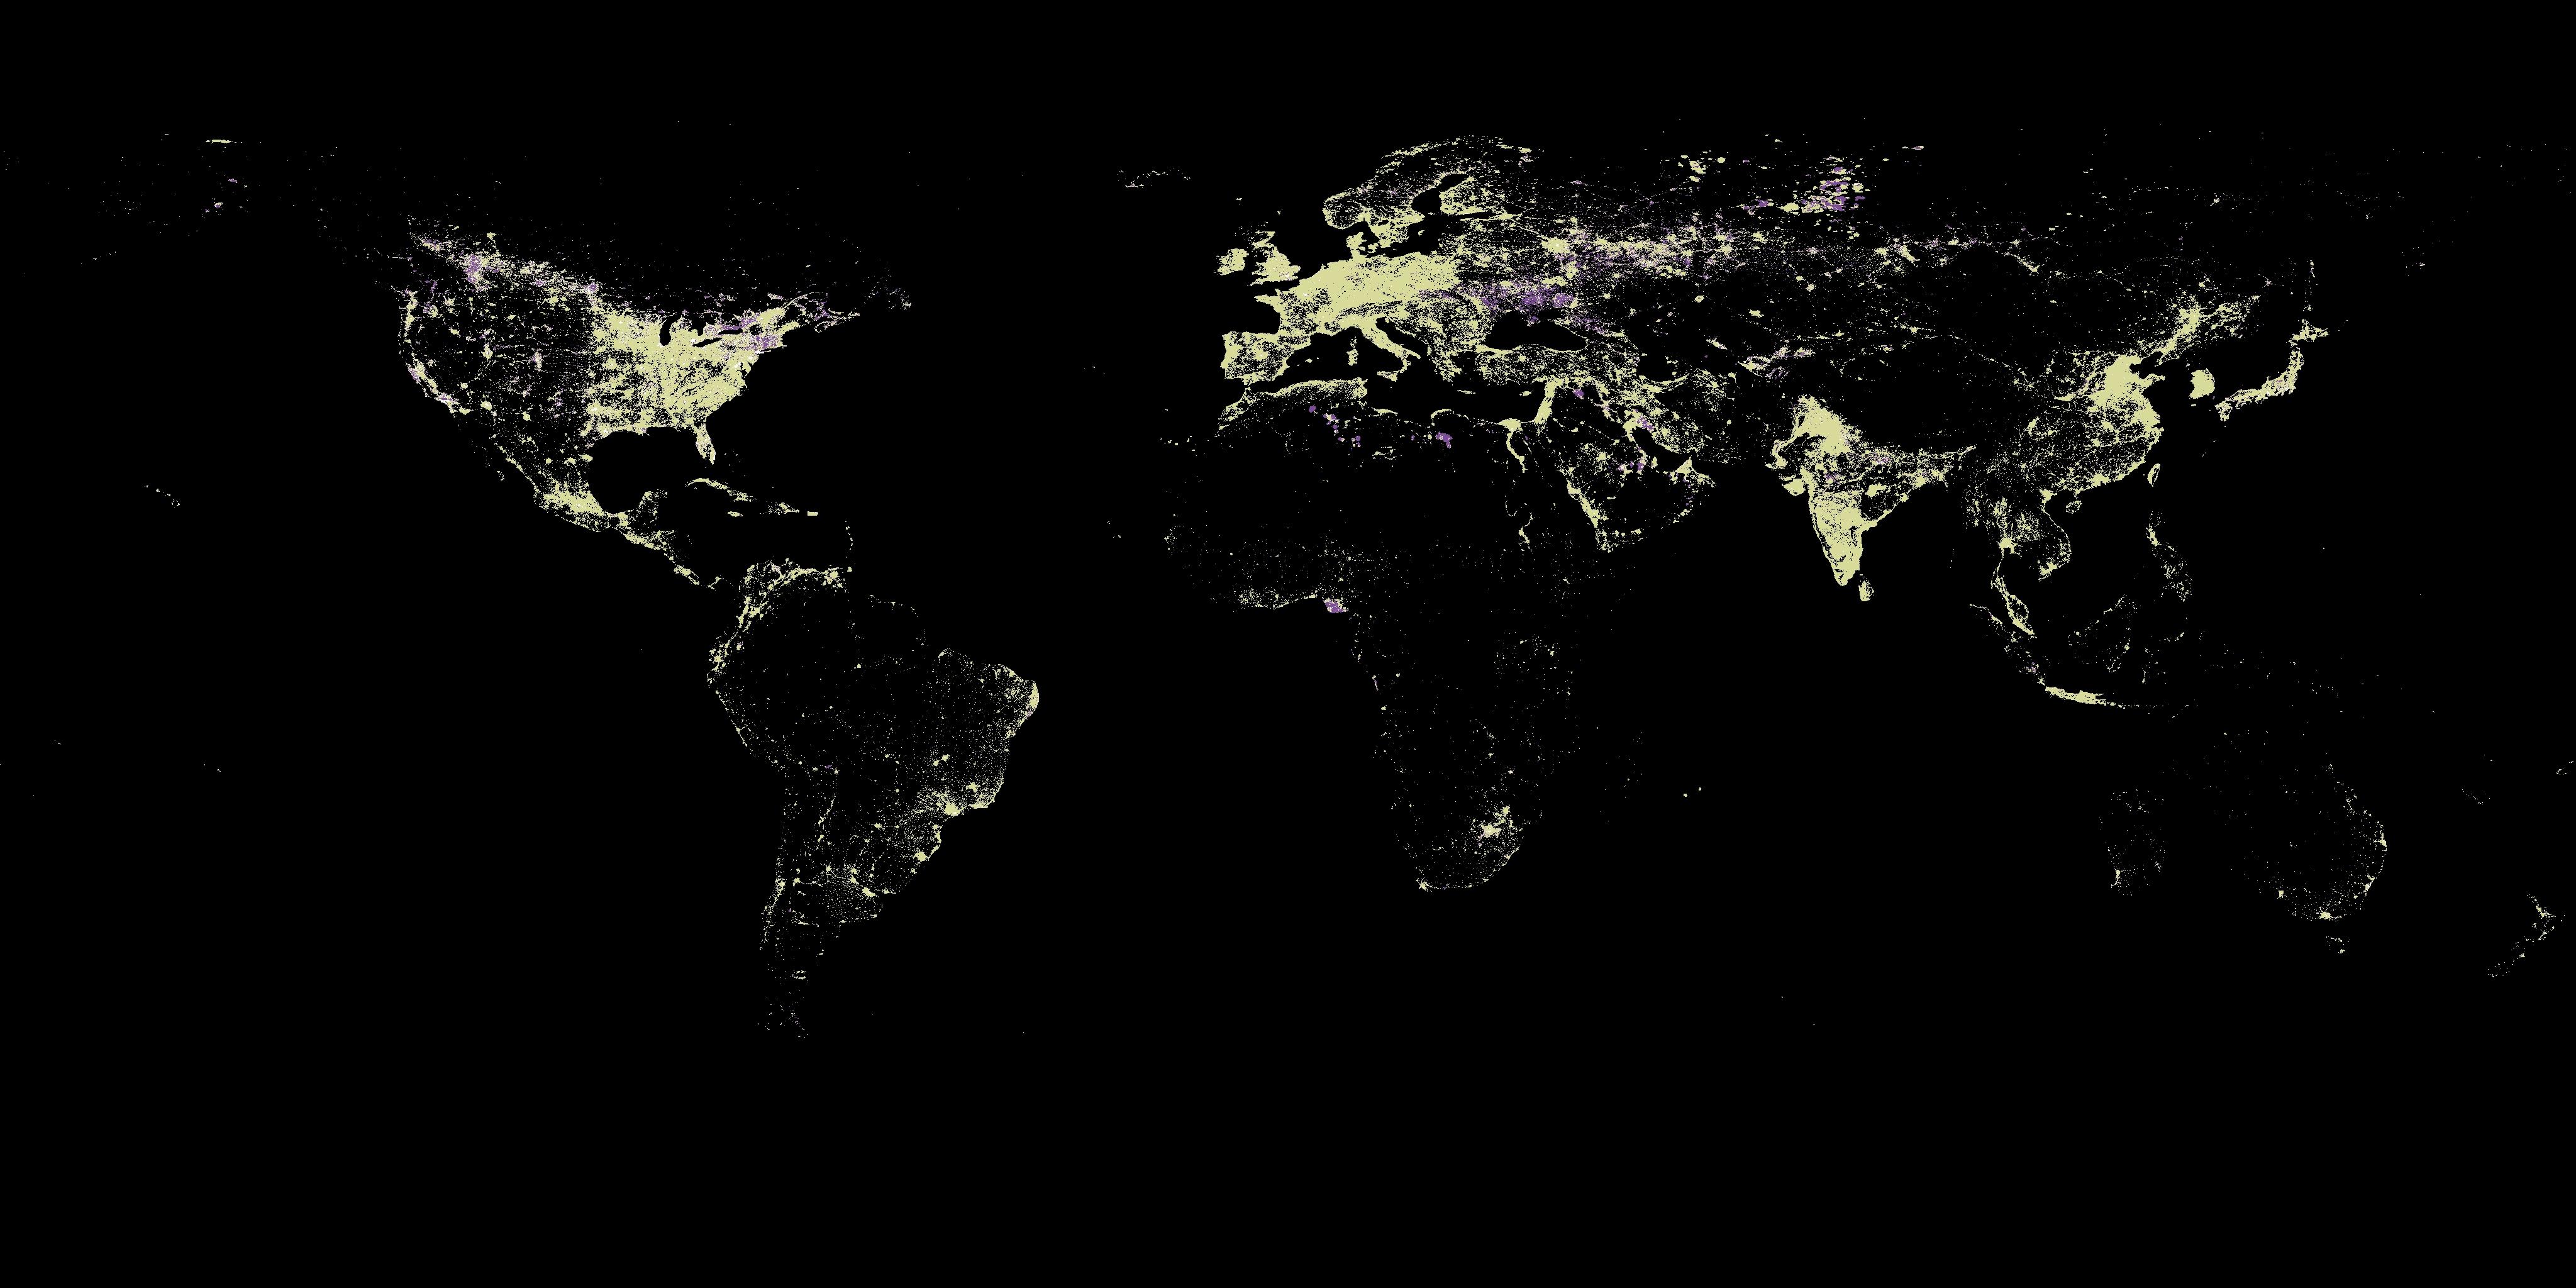 Nocne Zdjecia Satelitarne Co Nam Mowia Datablog Infografika